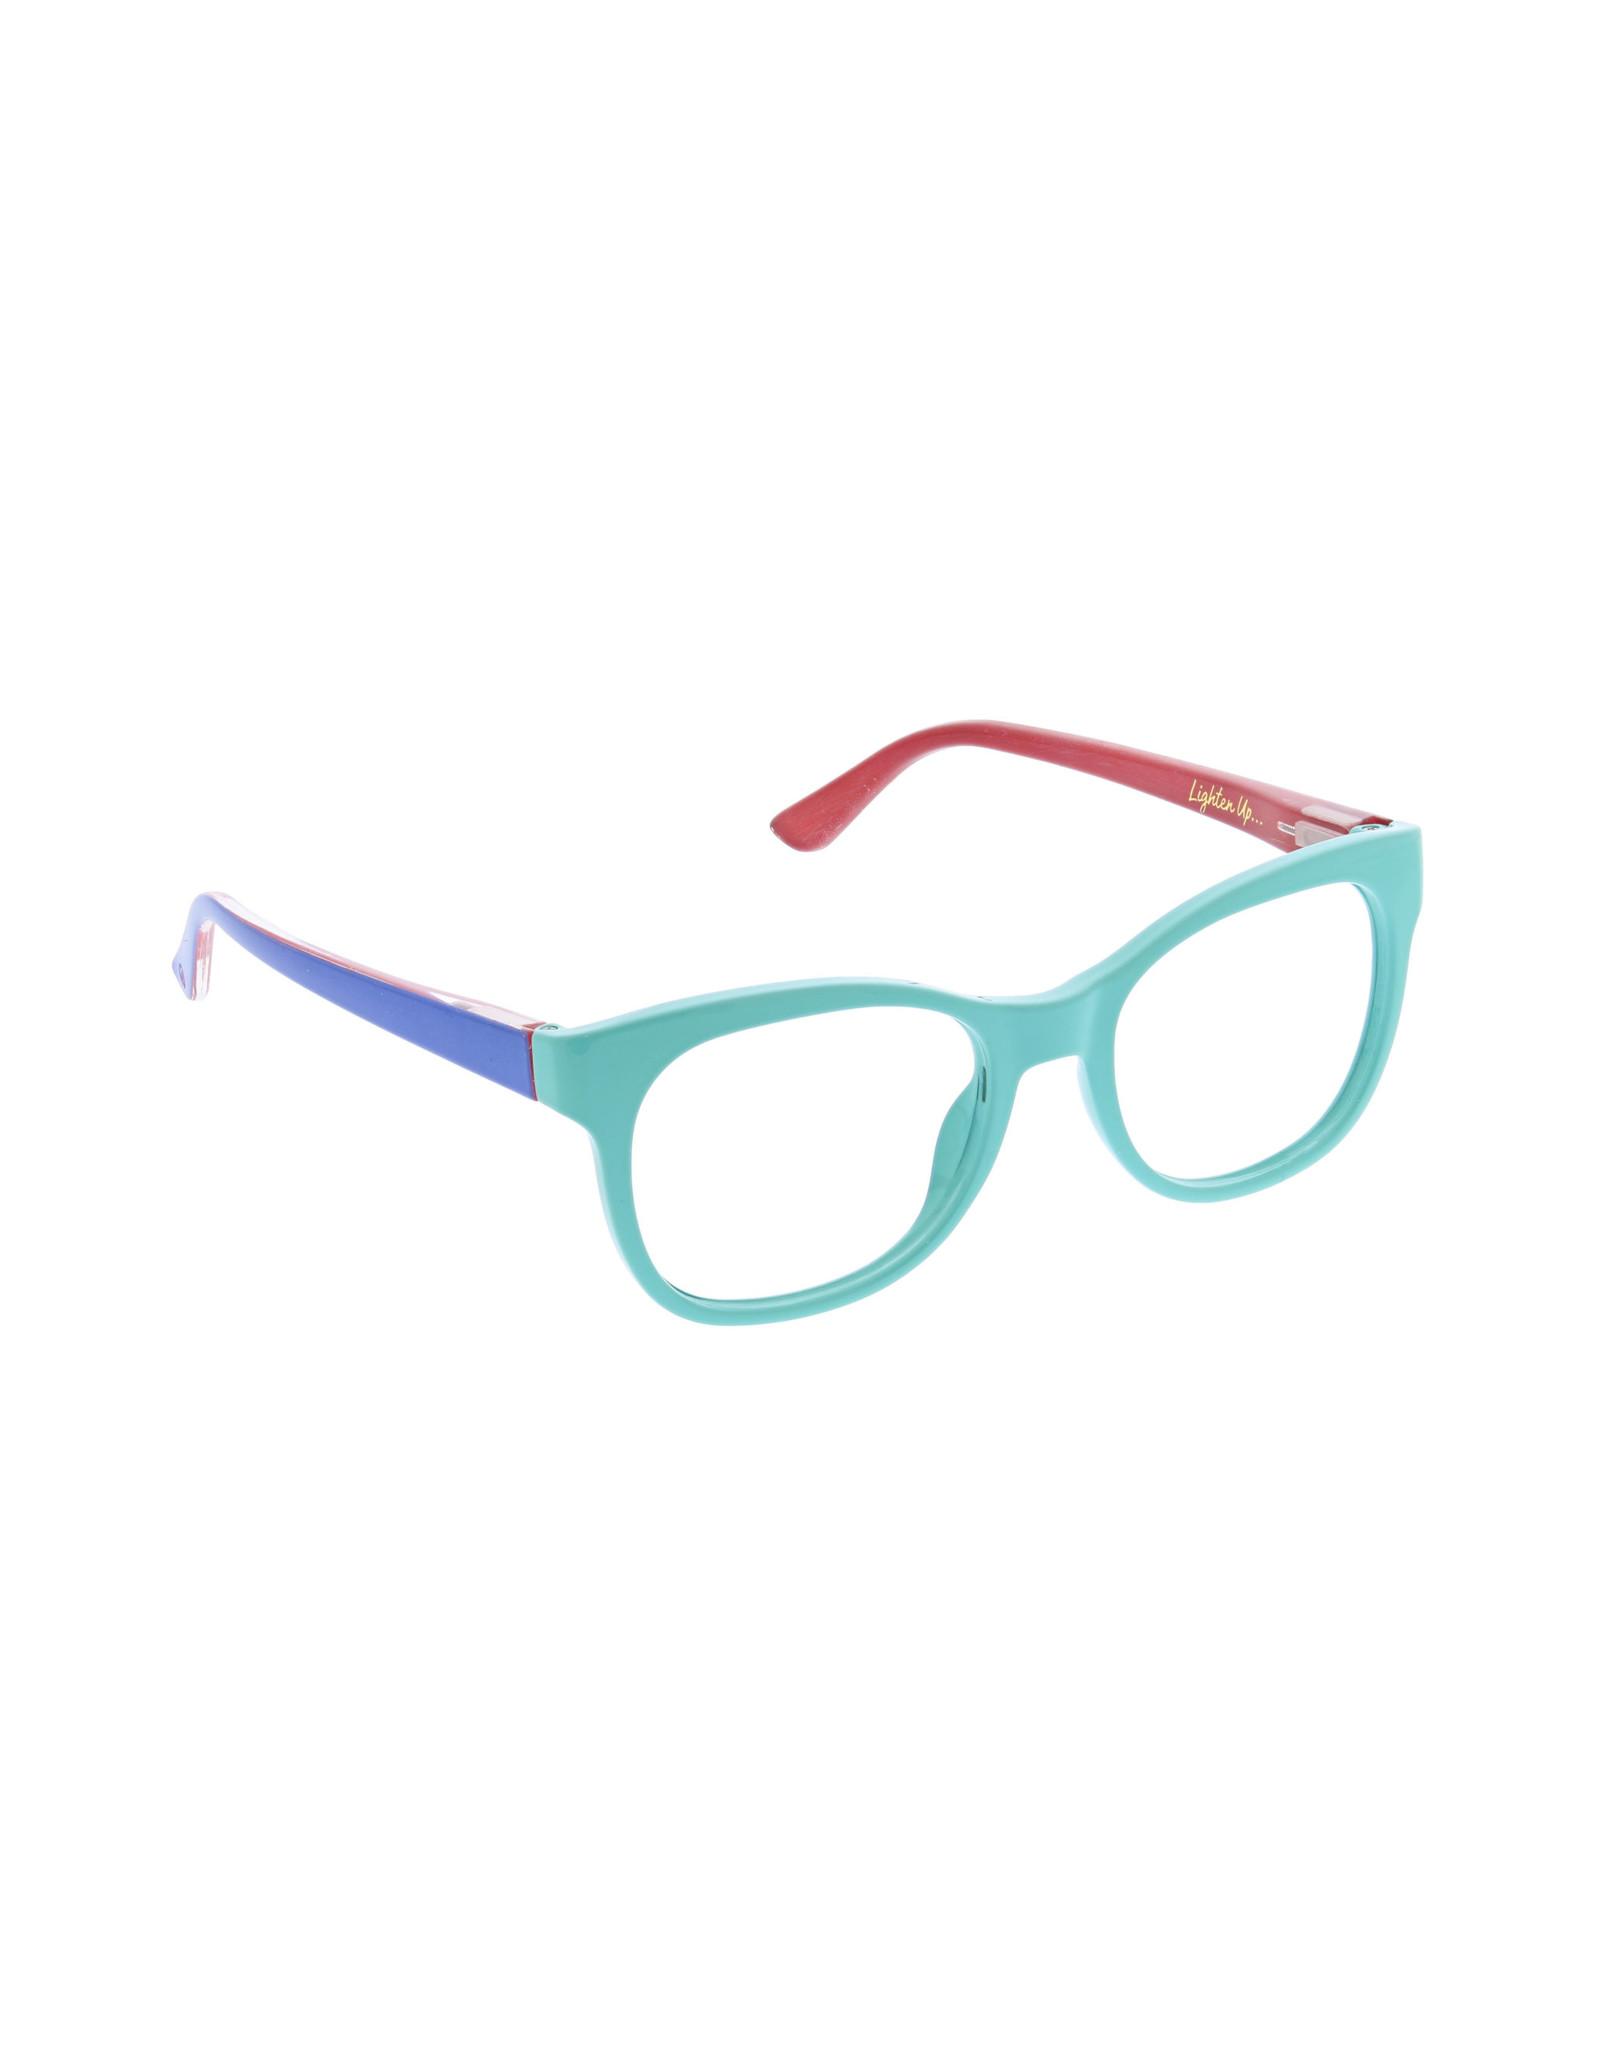 Peepers Light Bright Aqua/Blue + 2.25